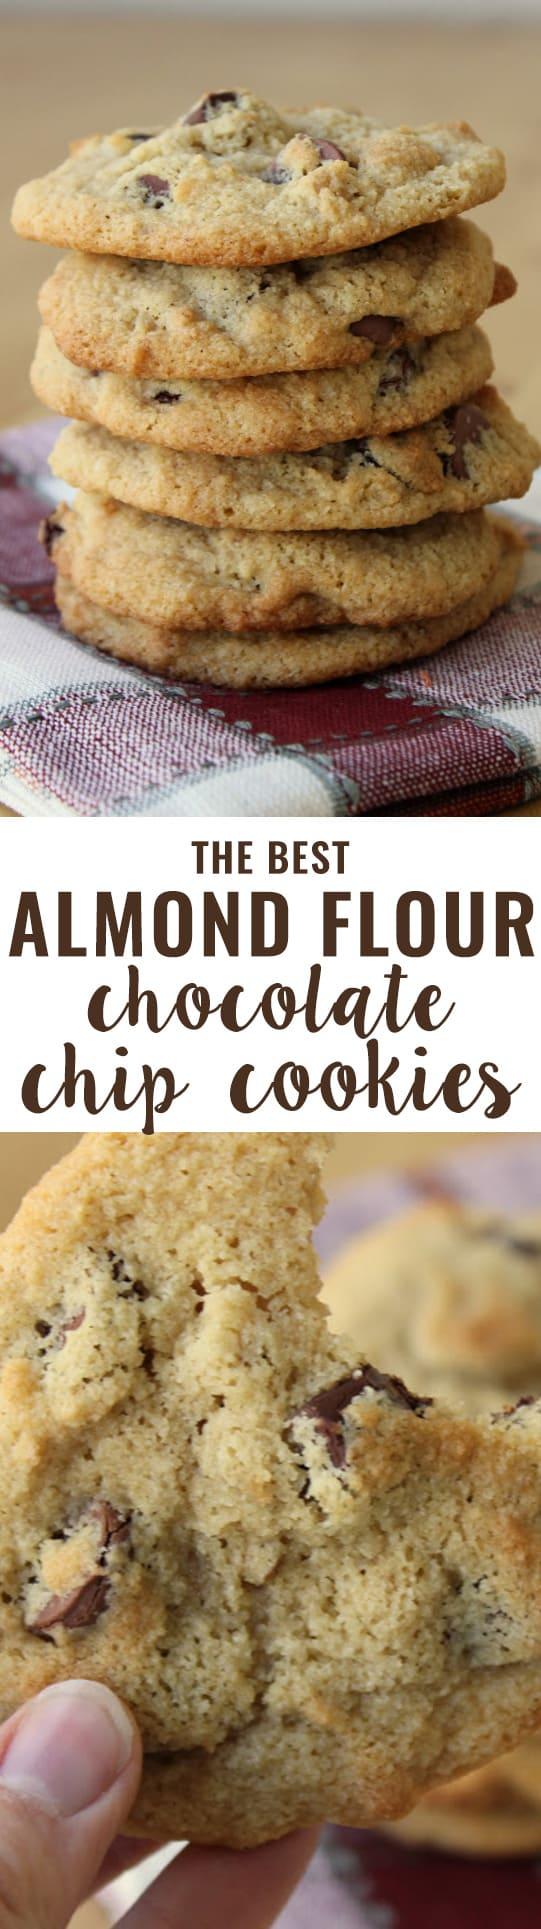 Almond Flour Chocolate Chip Cookies Sugar Free